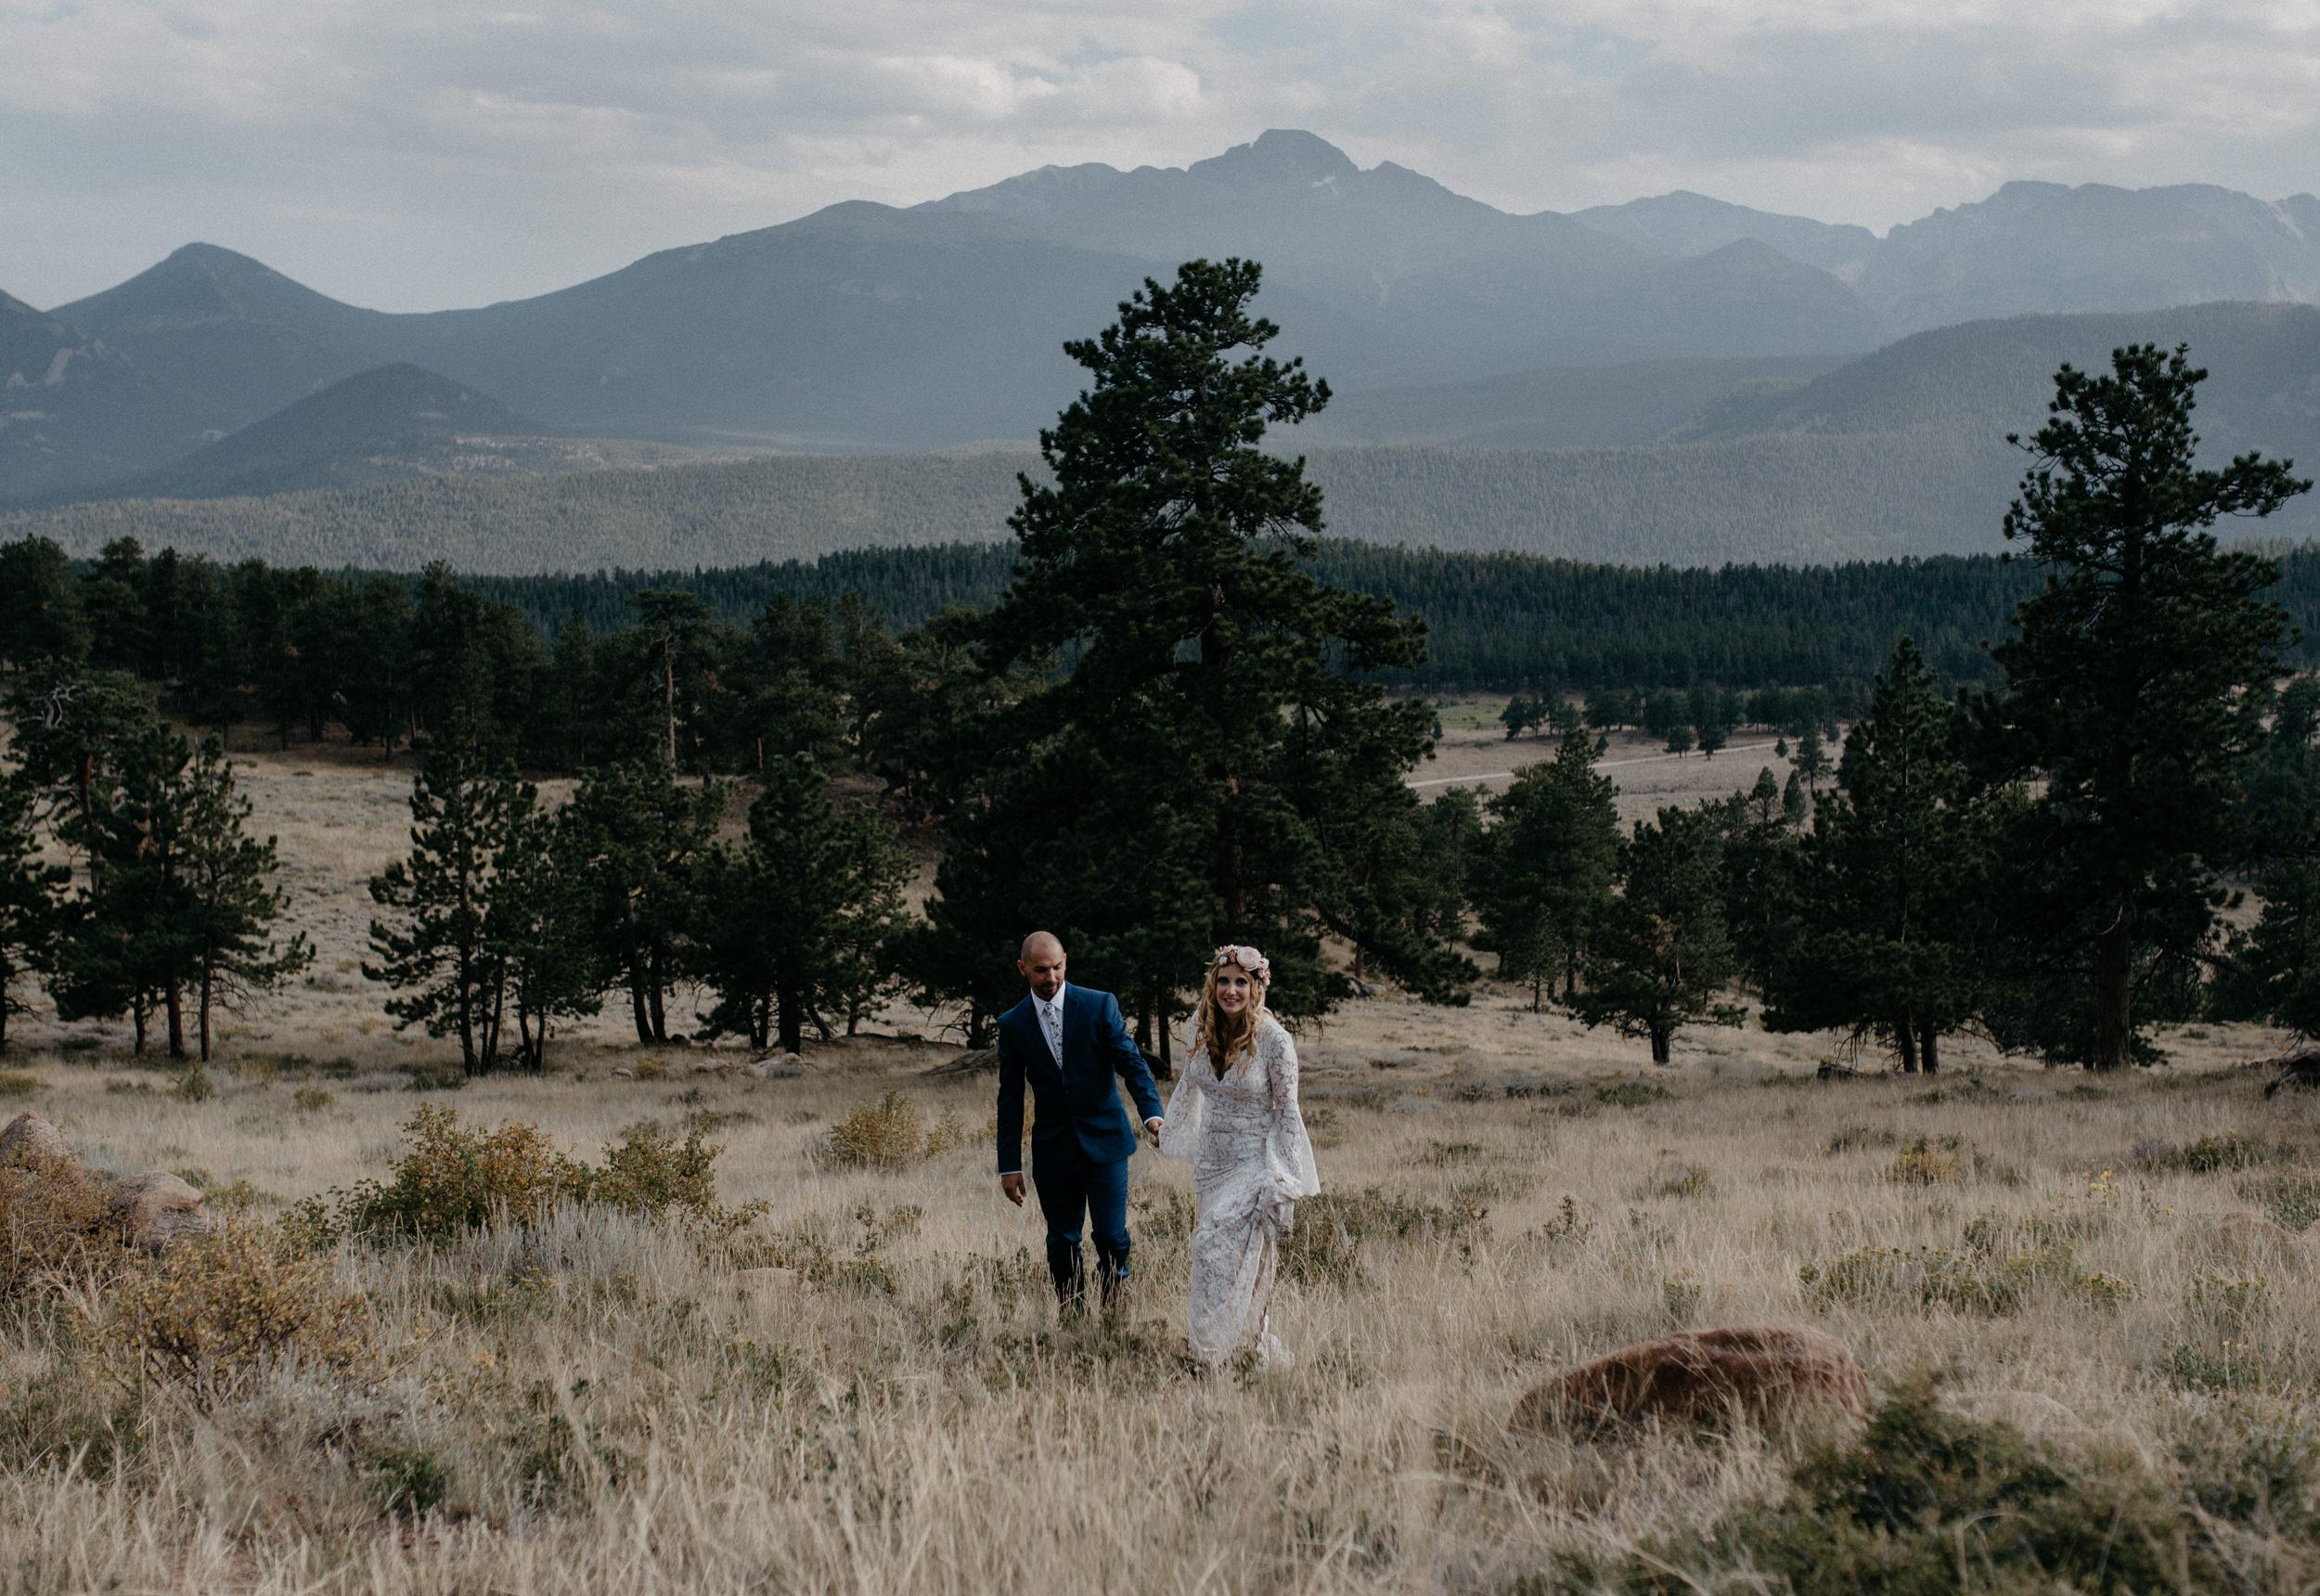 Colorado elopement photos at 3M Curve. Rocky Mountain National Park wedding photographer.